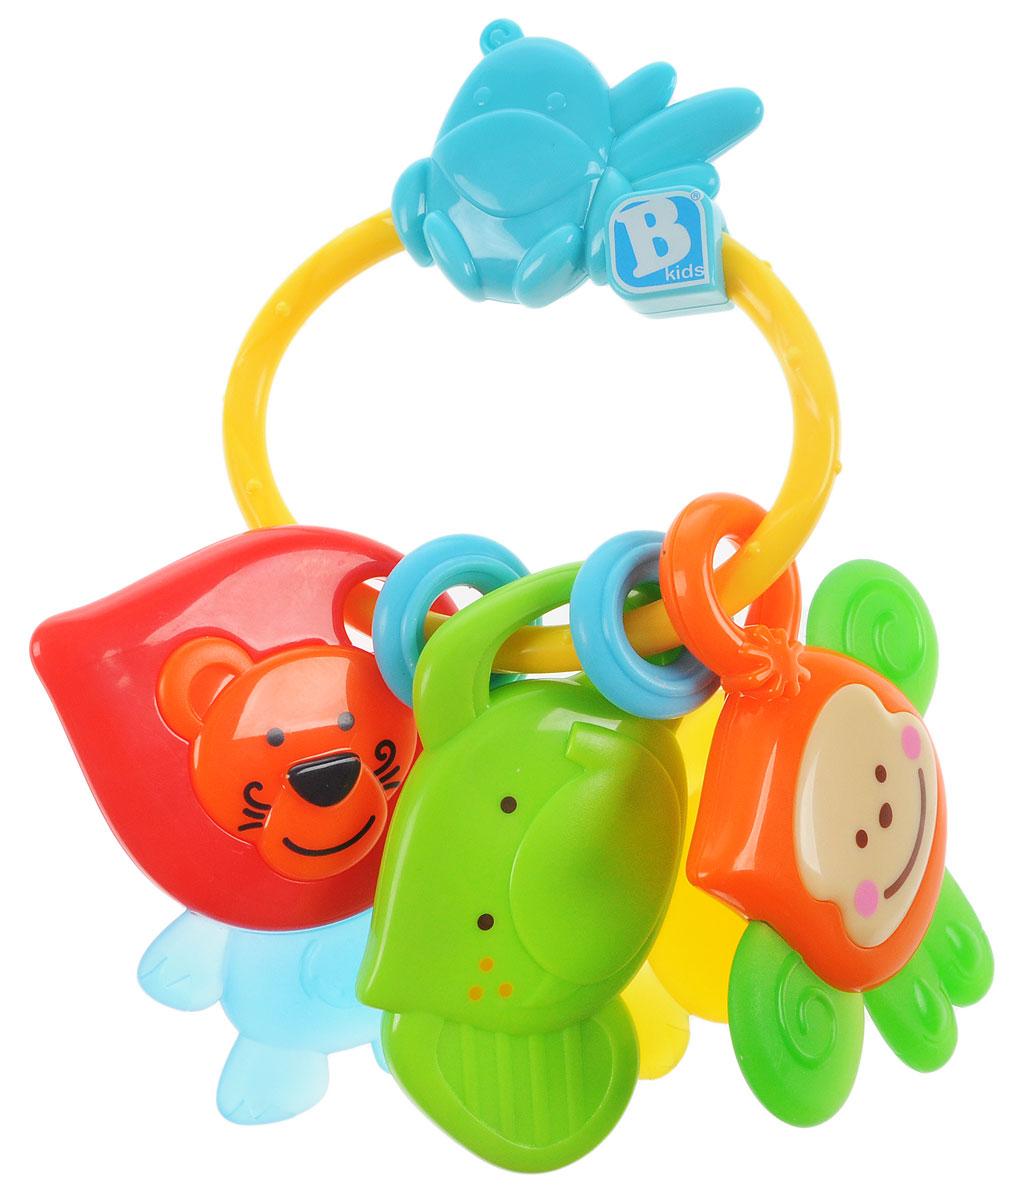 B kids Развивающая игрушка Листочки